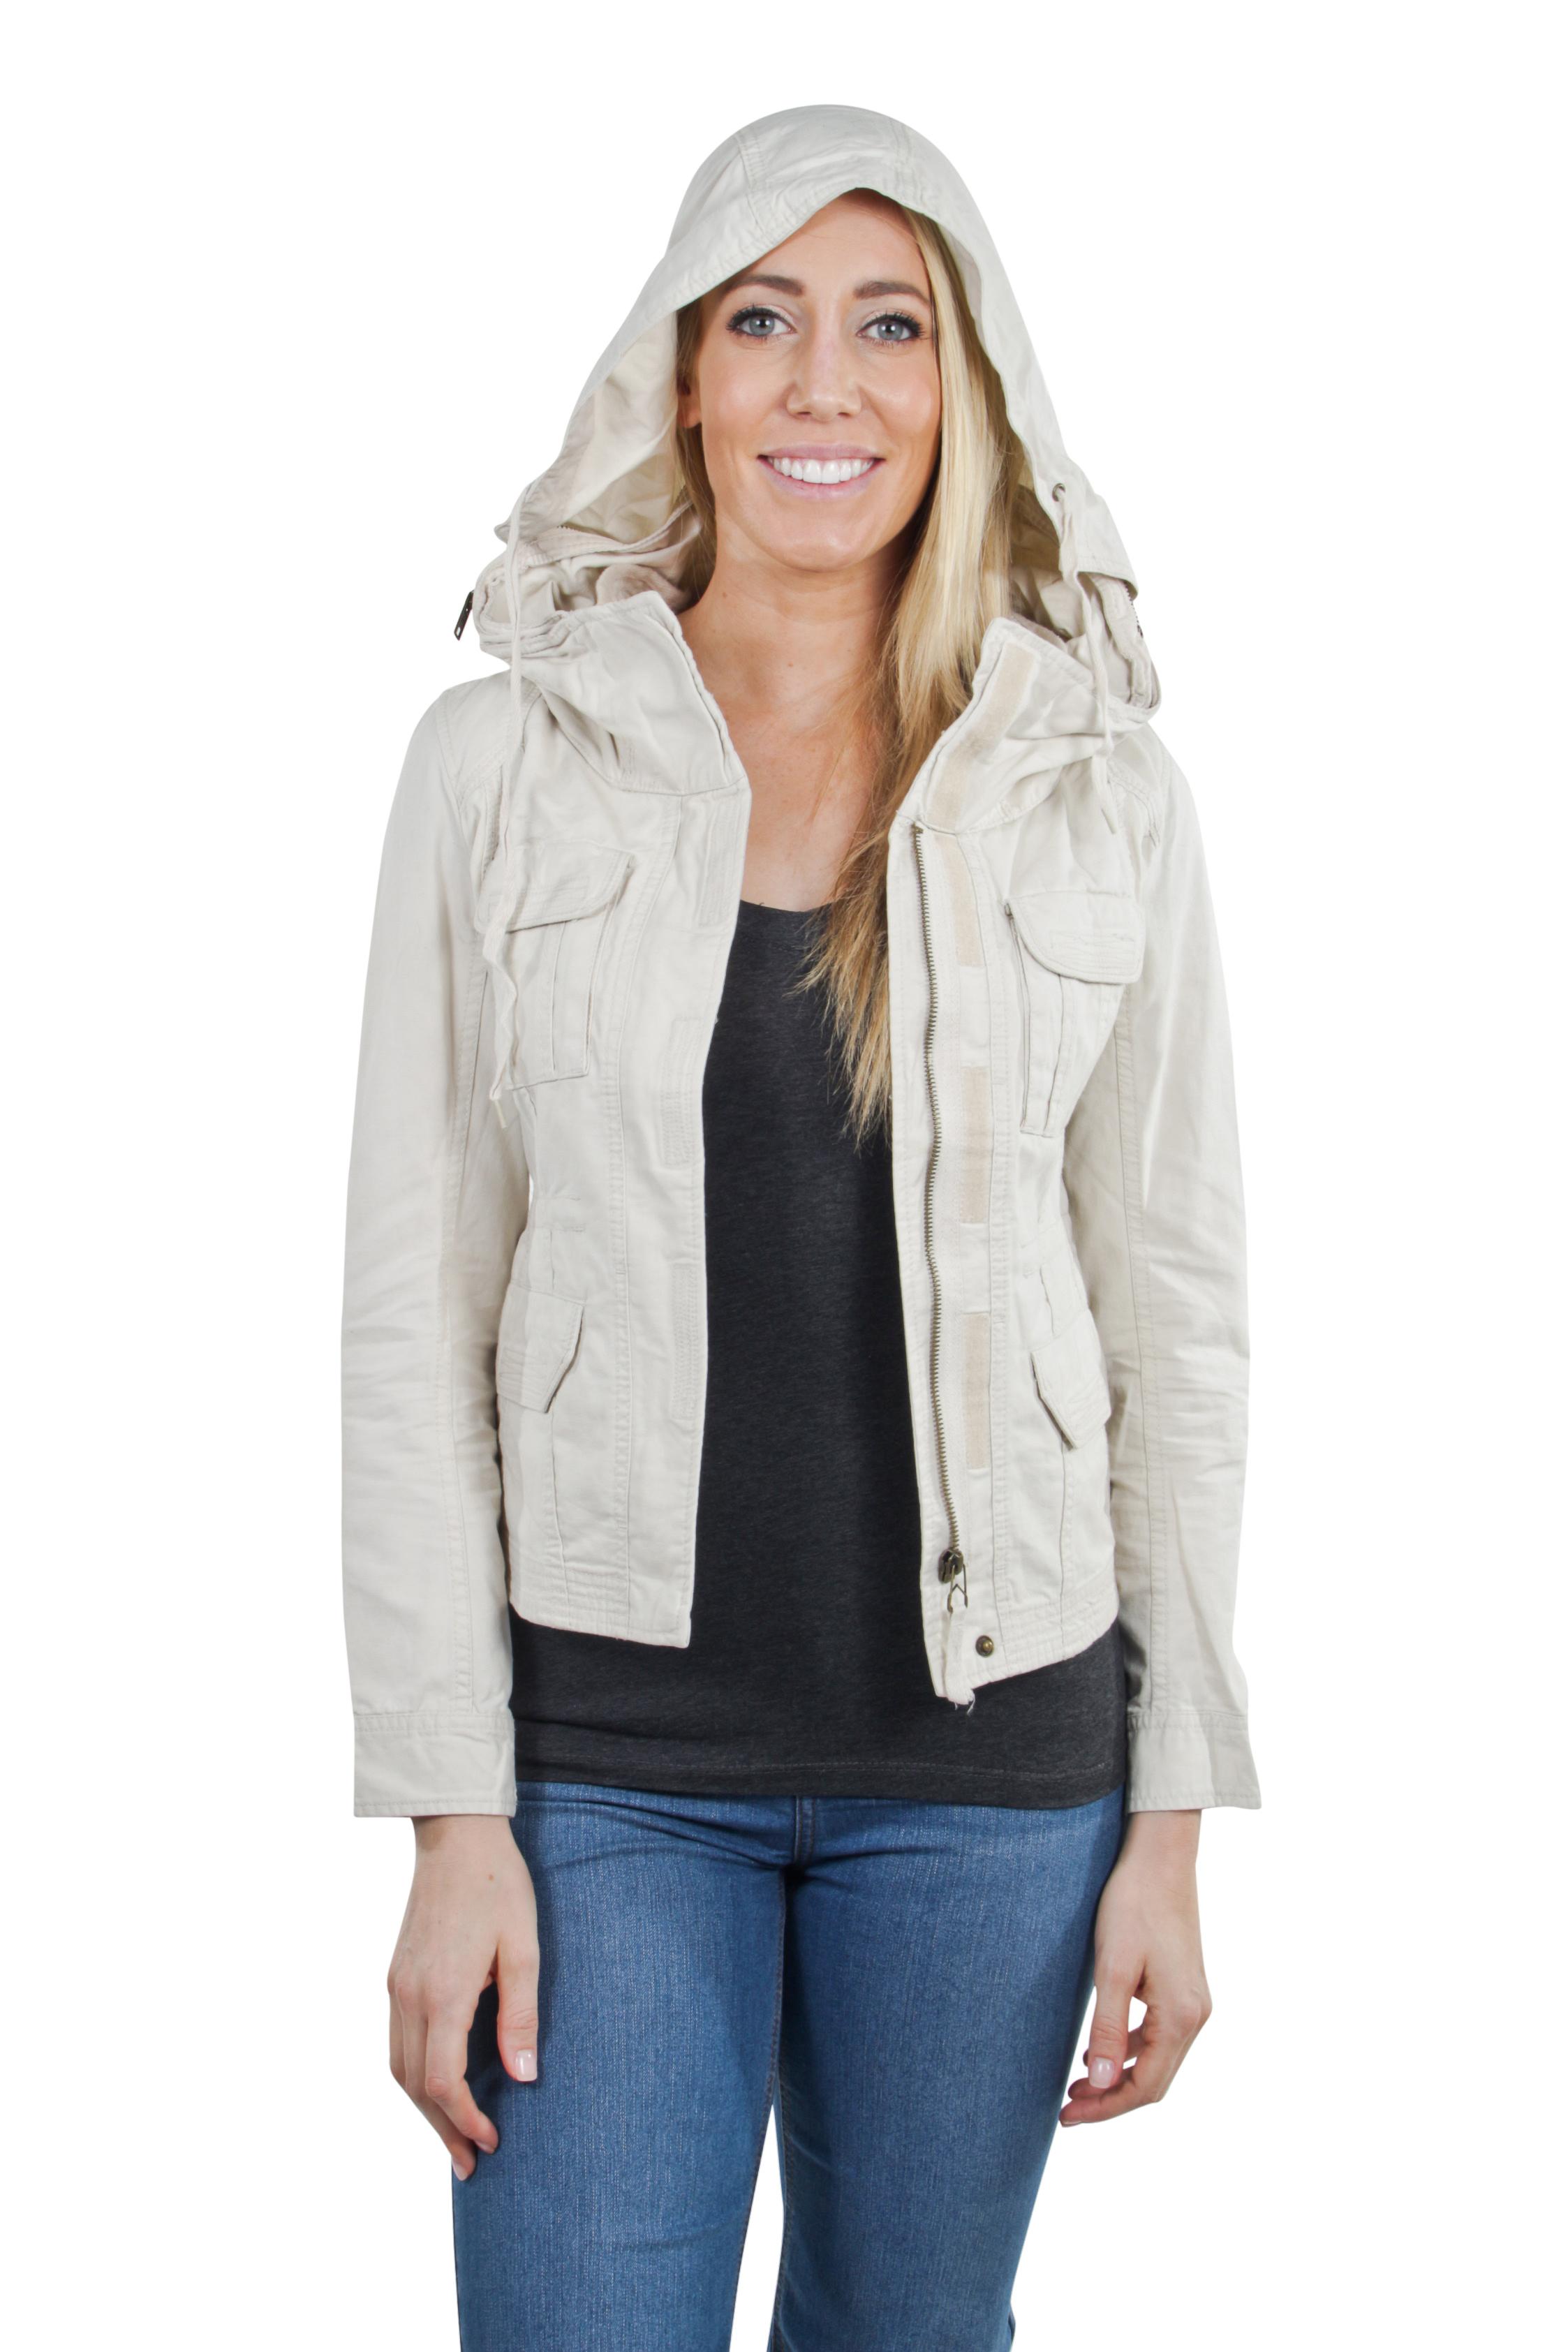 Women-039-s-Juniors-Anorak-Safari-Hoodie-Long-Sleeve-Jacket thumbnail 6